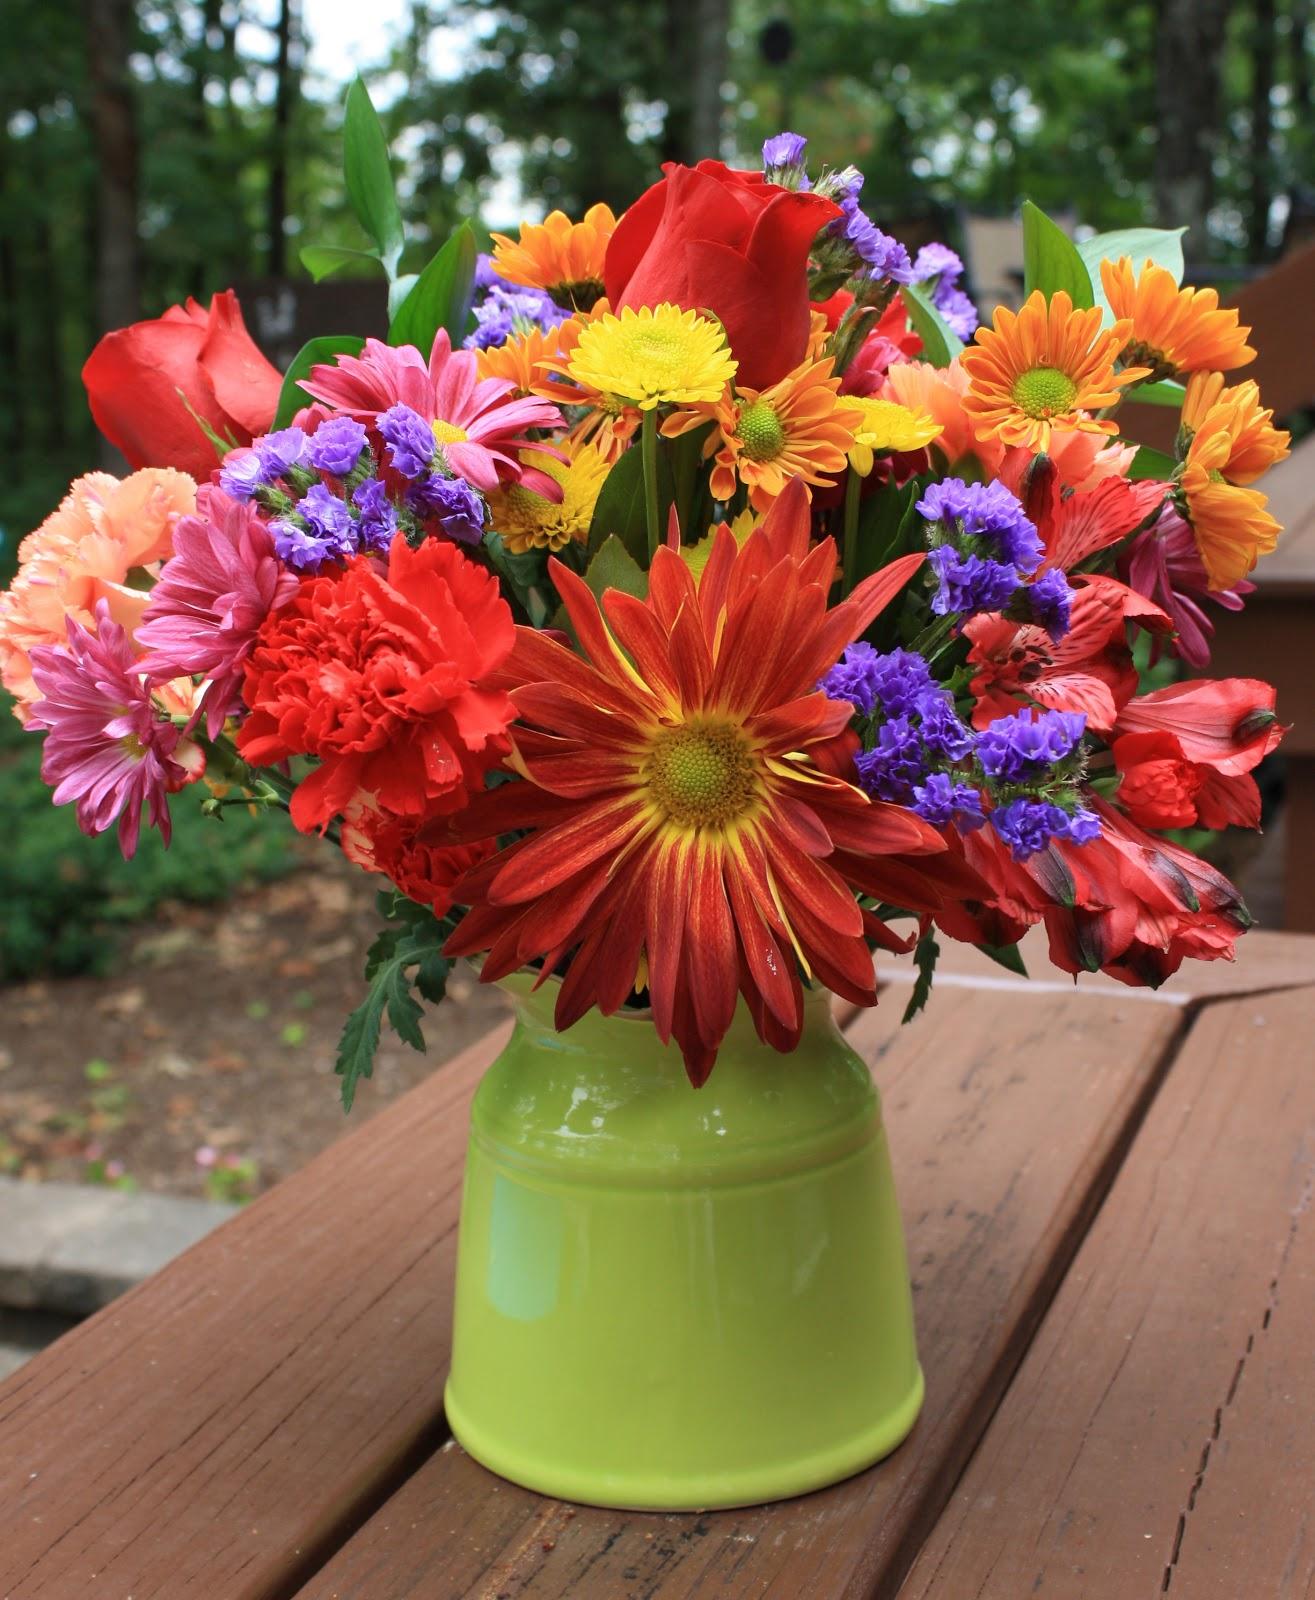 100 kroger flowers wedding how to make a farmstand flower bouquet u2013 good morning. Black Bedroom Furniture Sets. Home Design Ideas